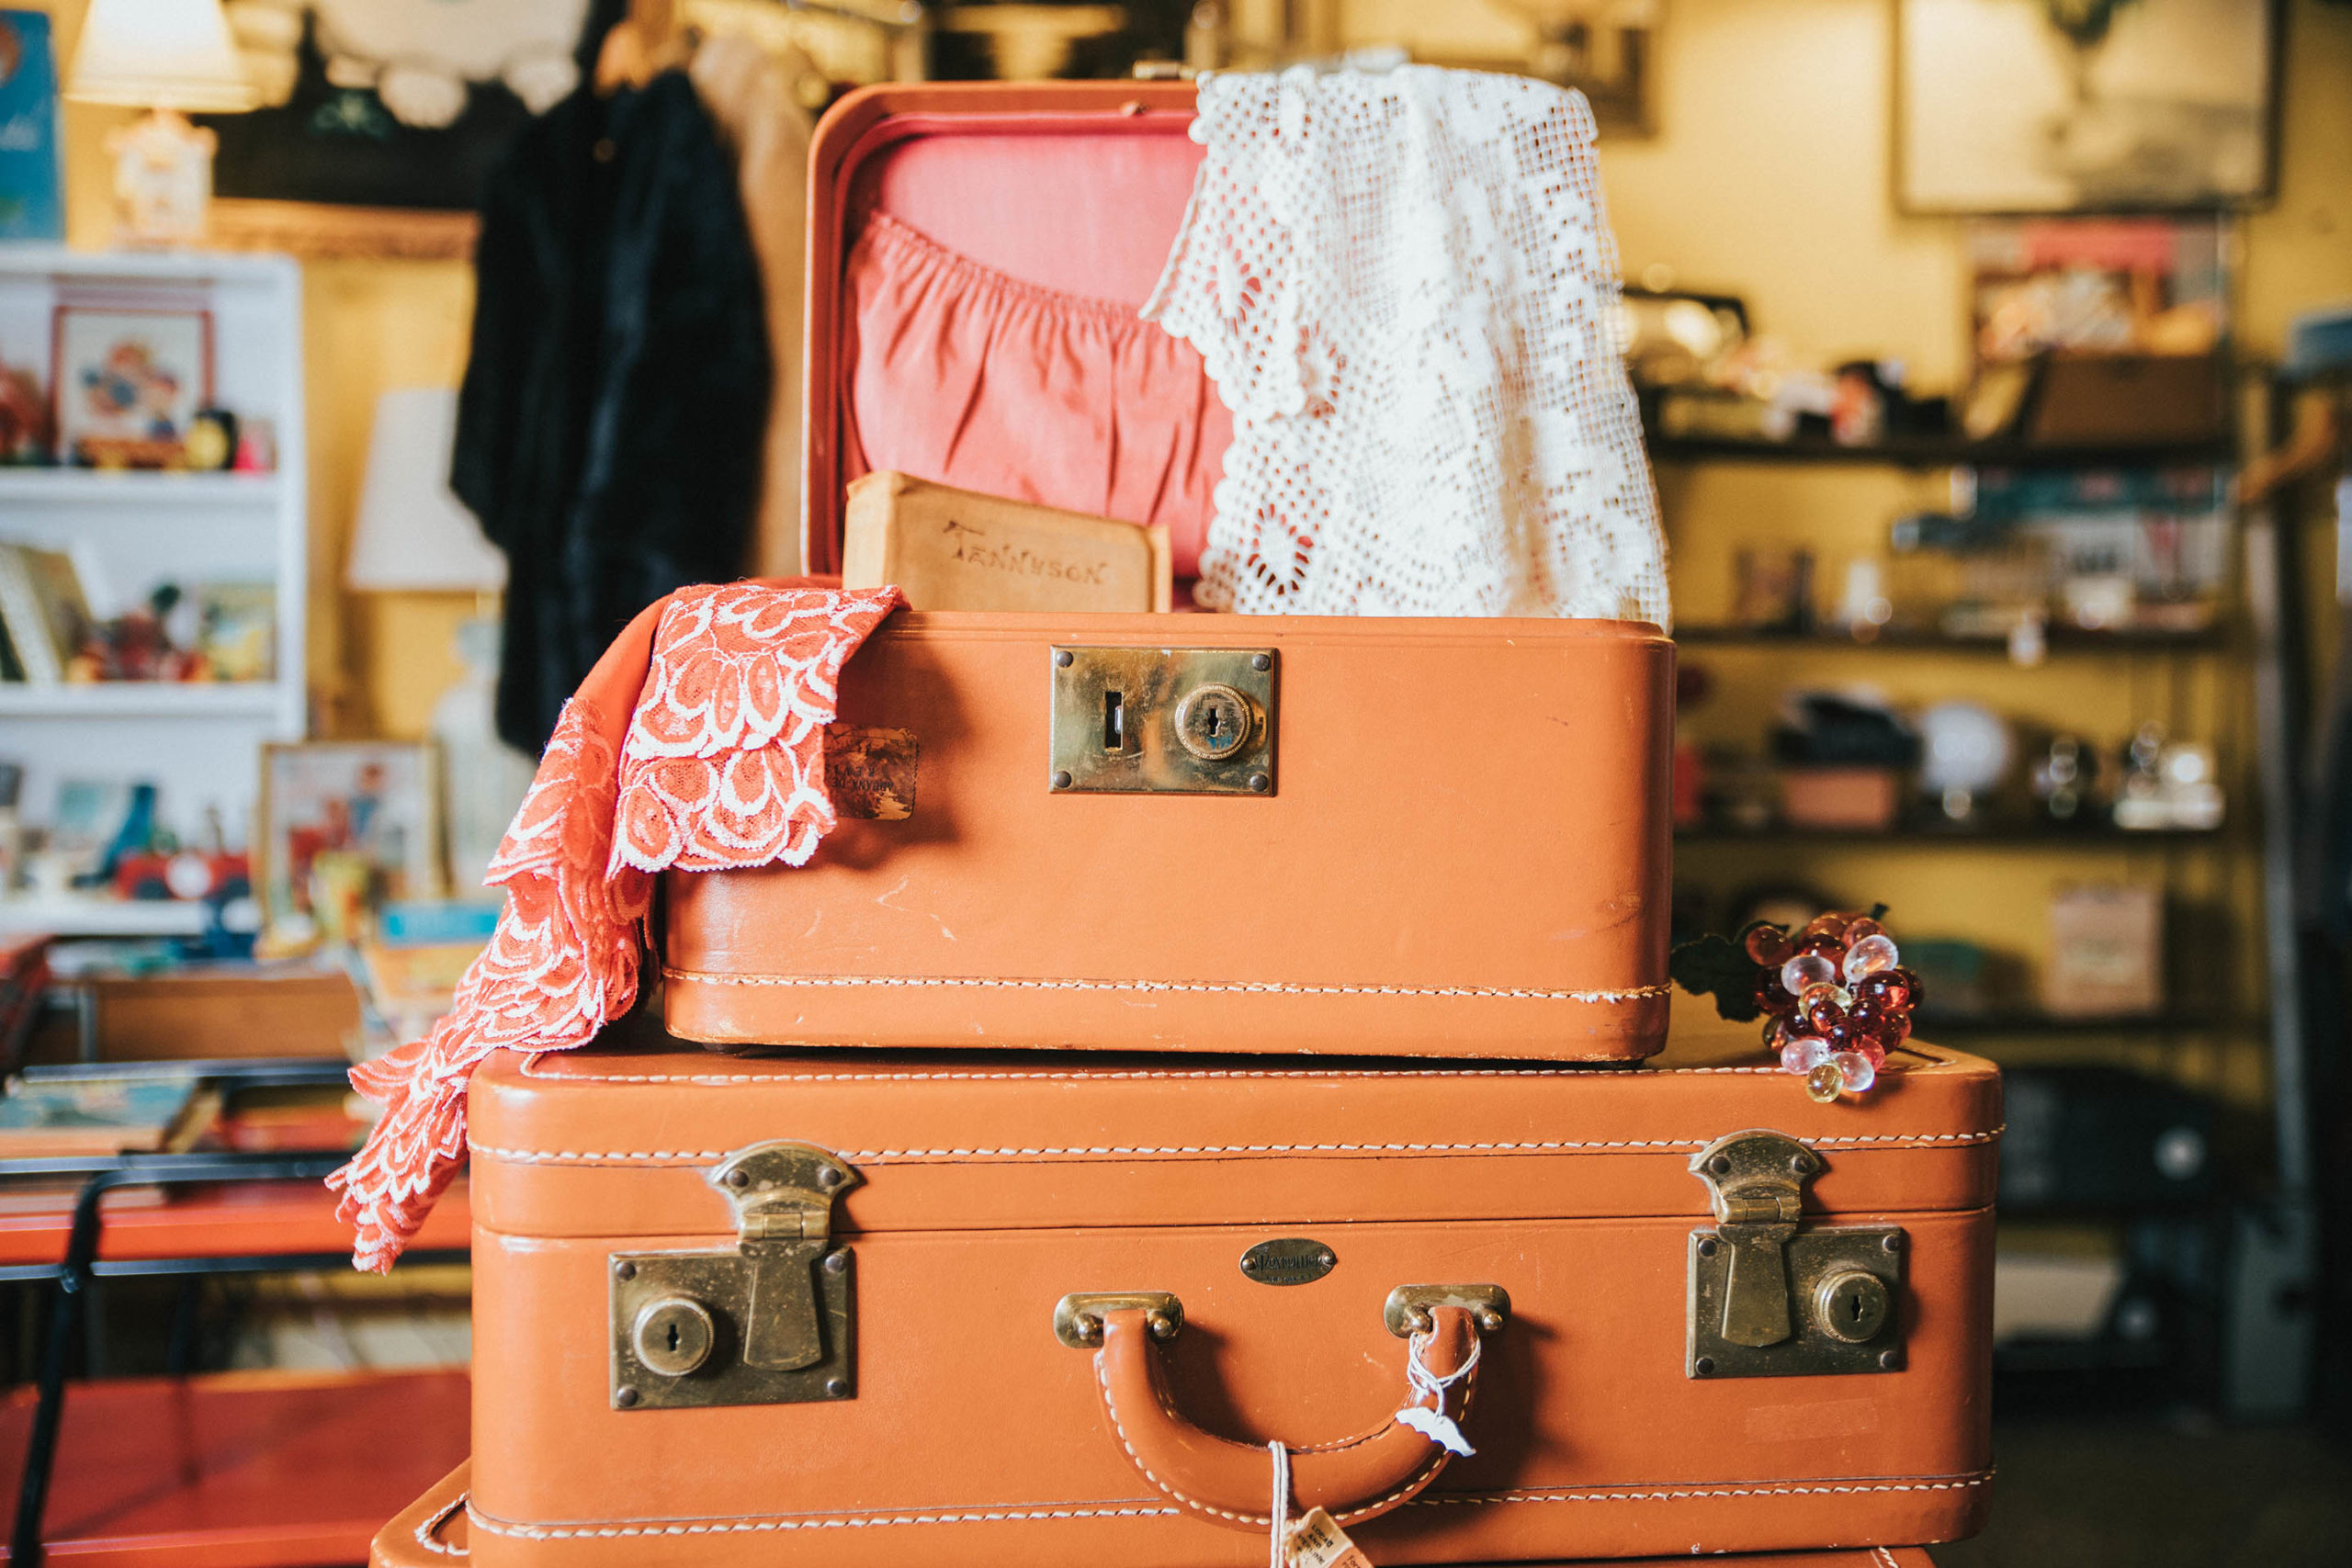 Old timey luggage